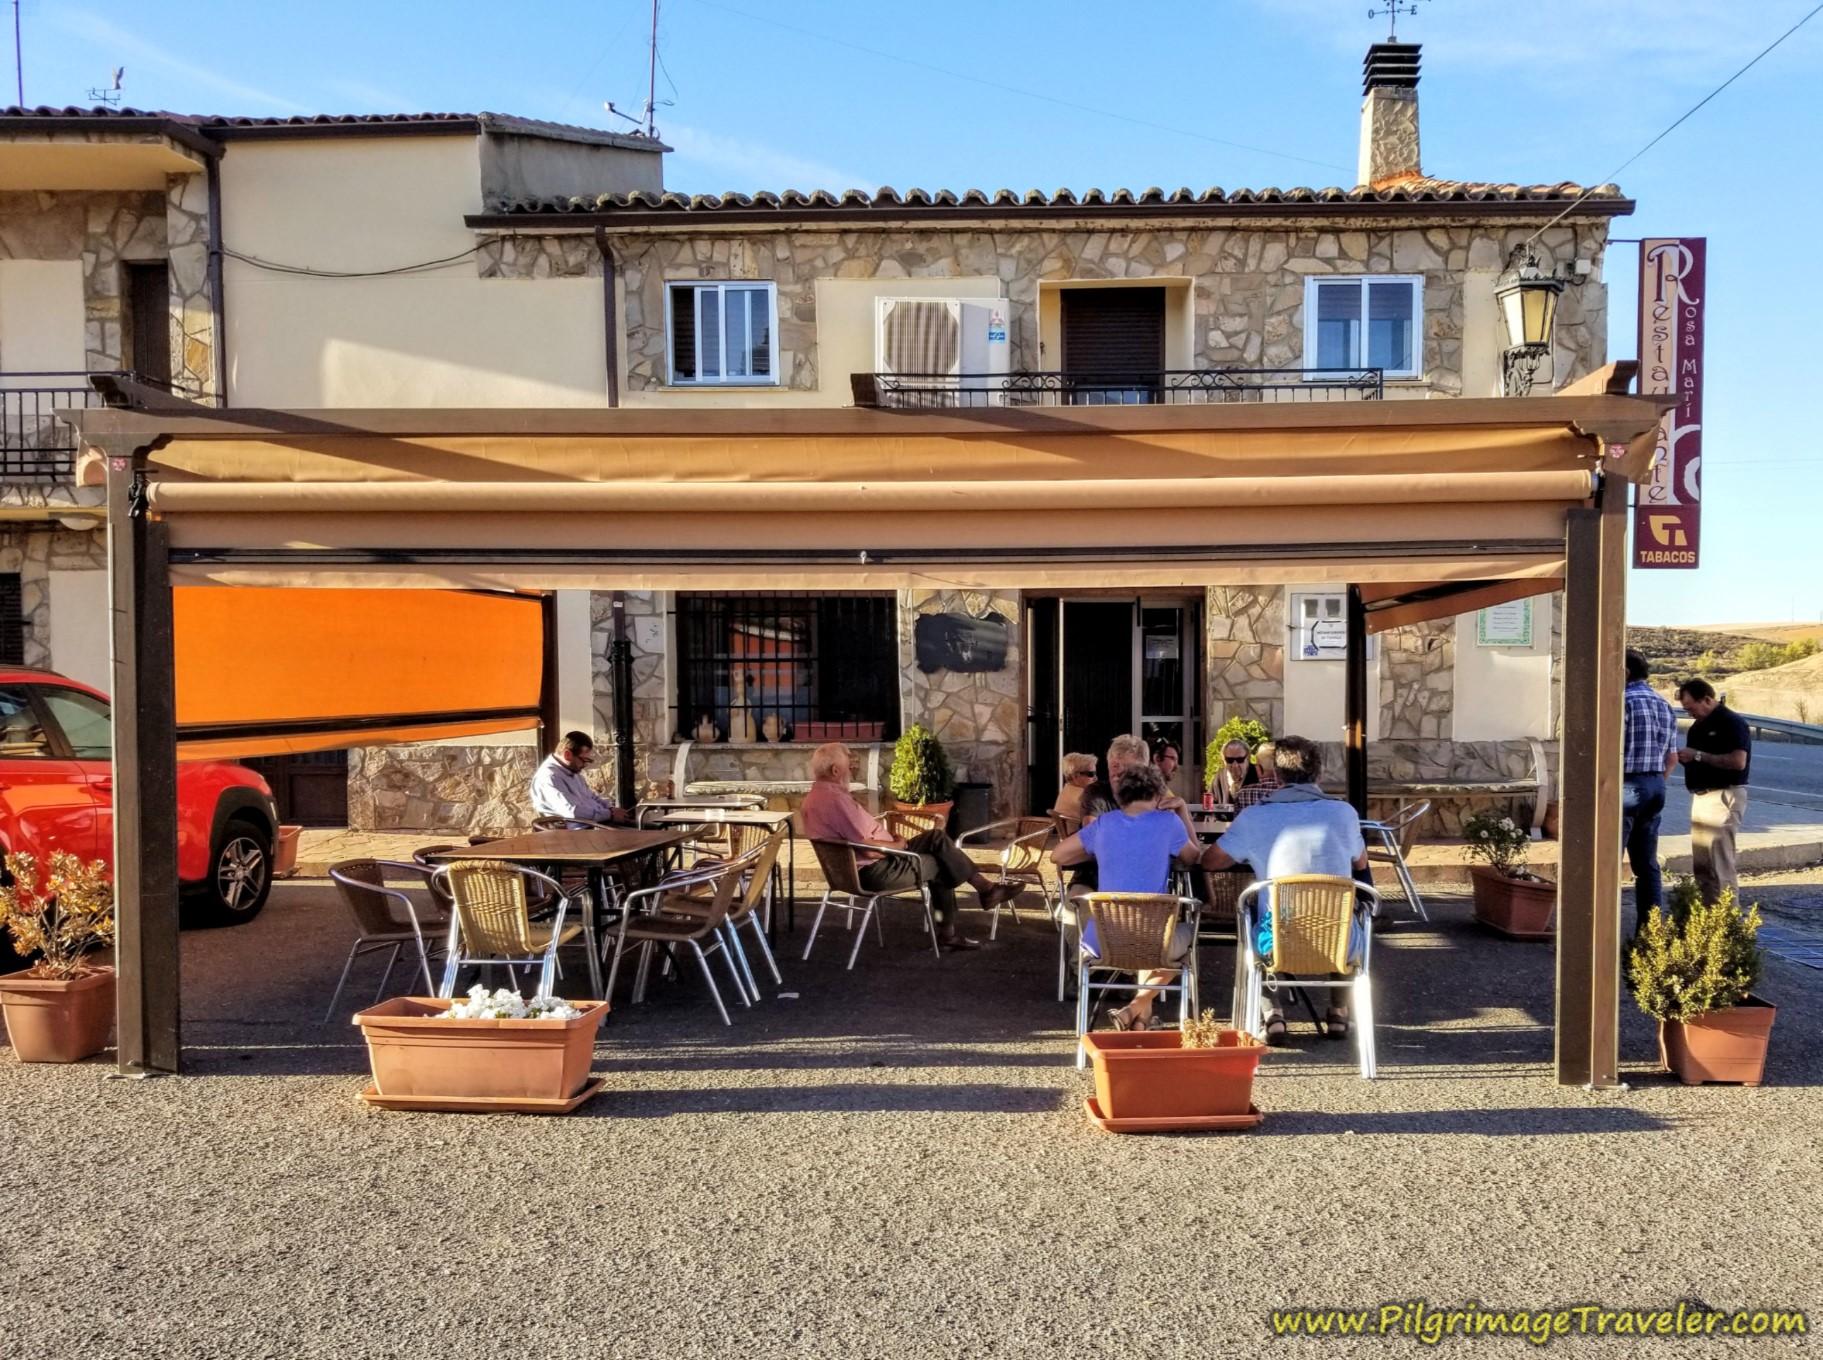 Restaurante Rosamari on the Vía de la Plata from Zamora to Montamarta